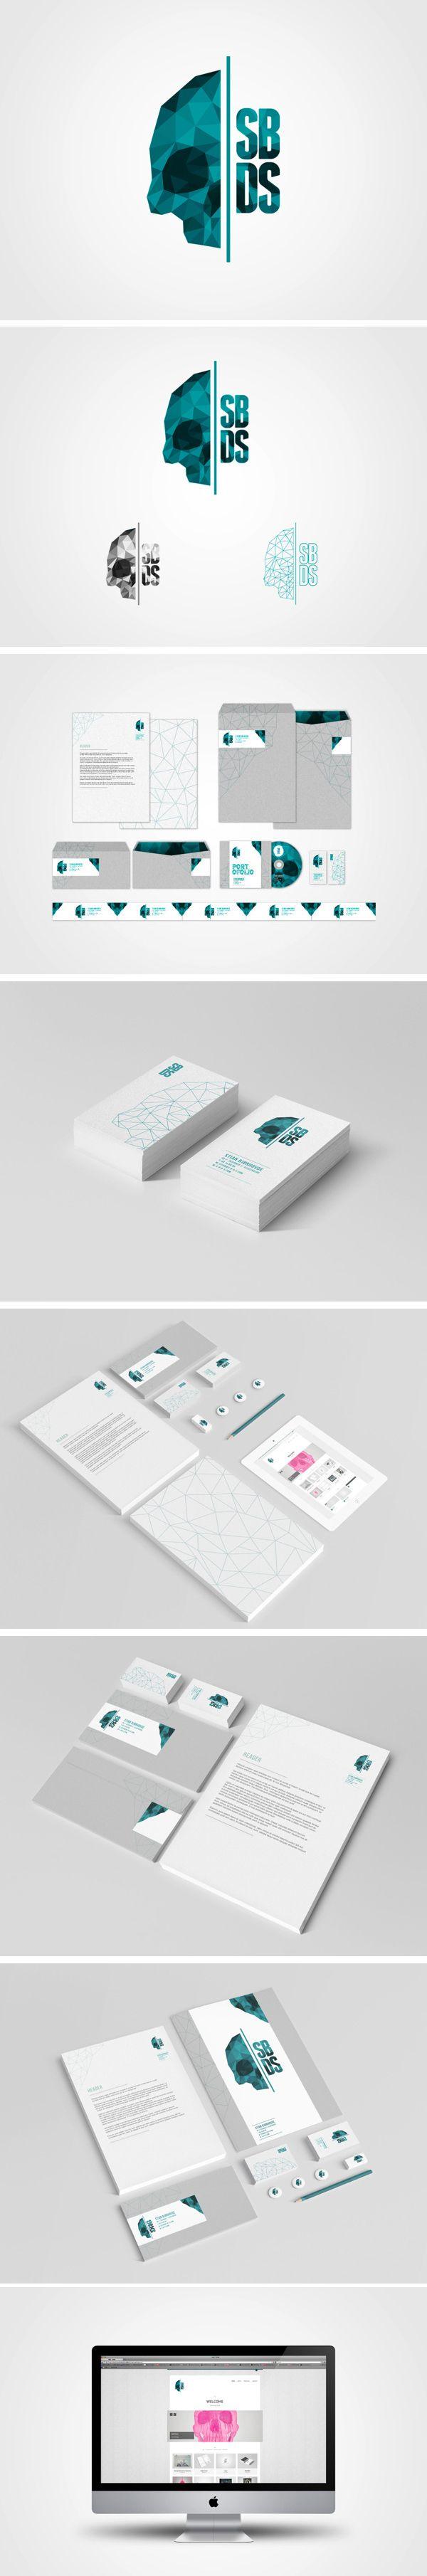 SBDS – Self Branding | #stationary #corporate #design #corporatedesign #identity #branding #marketing < repinned by www.BlickeDeeler.de | Take a look at www.LogoGestaltung-Hamburg.de